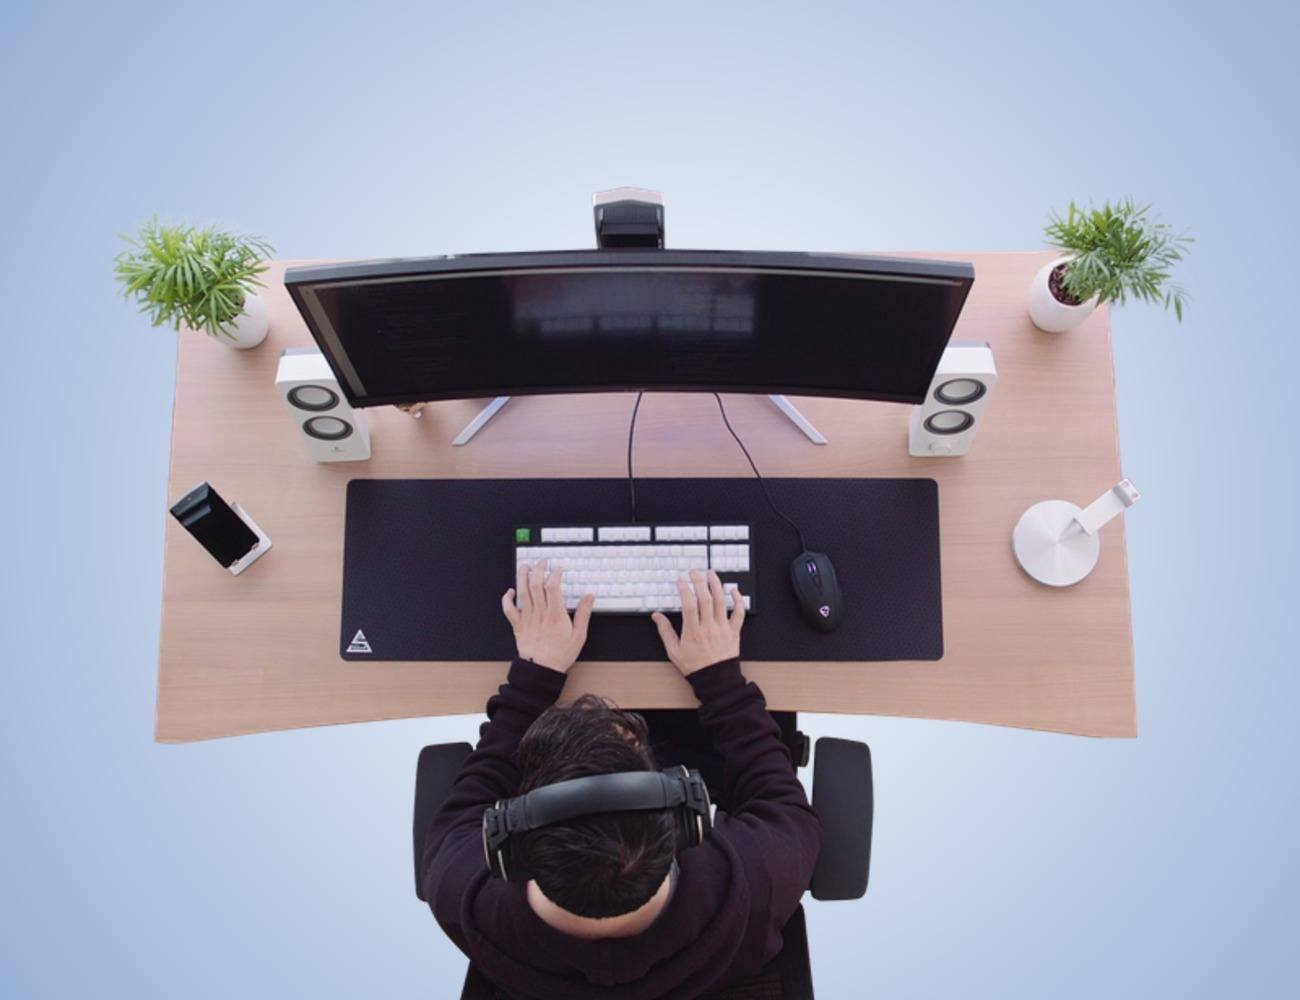 Foundry Portable Work Desk